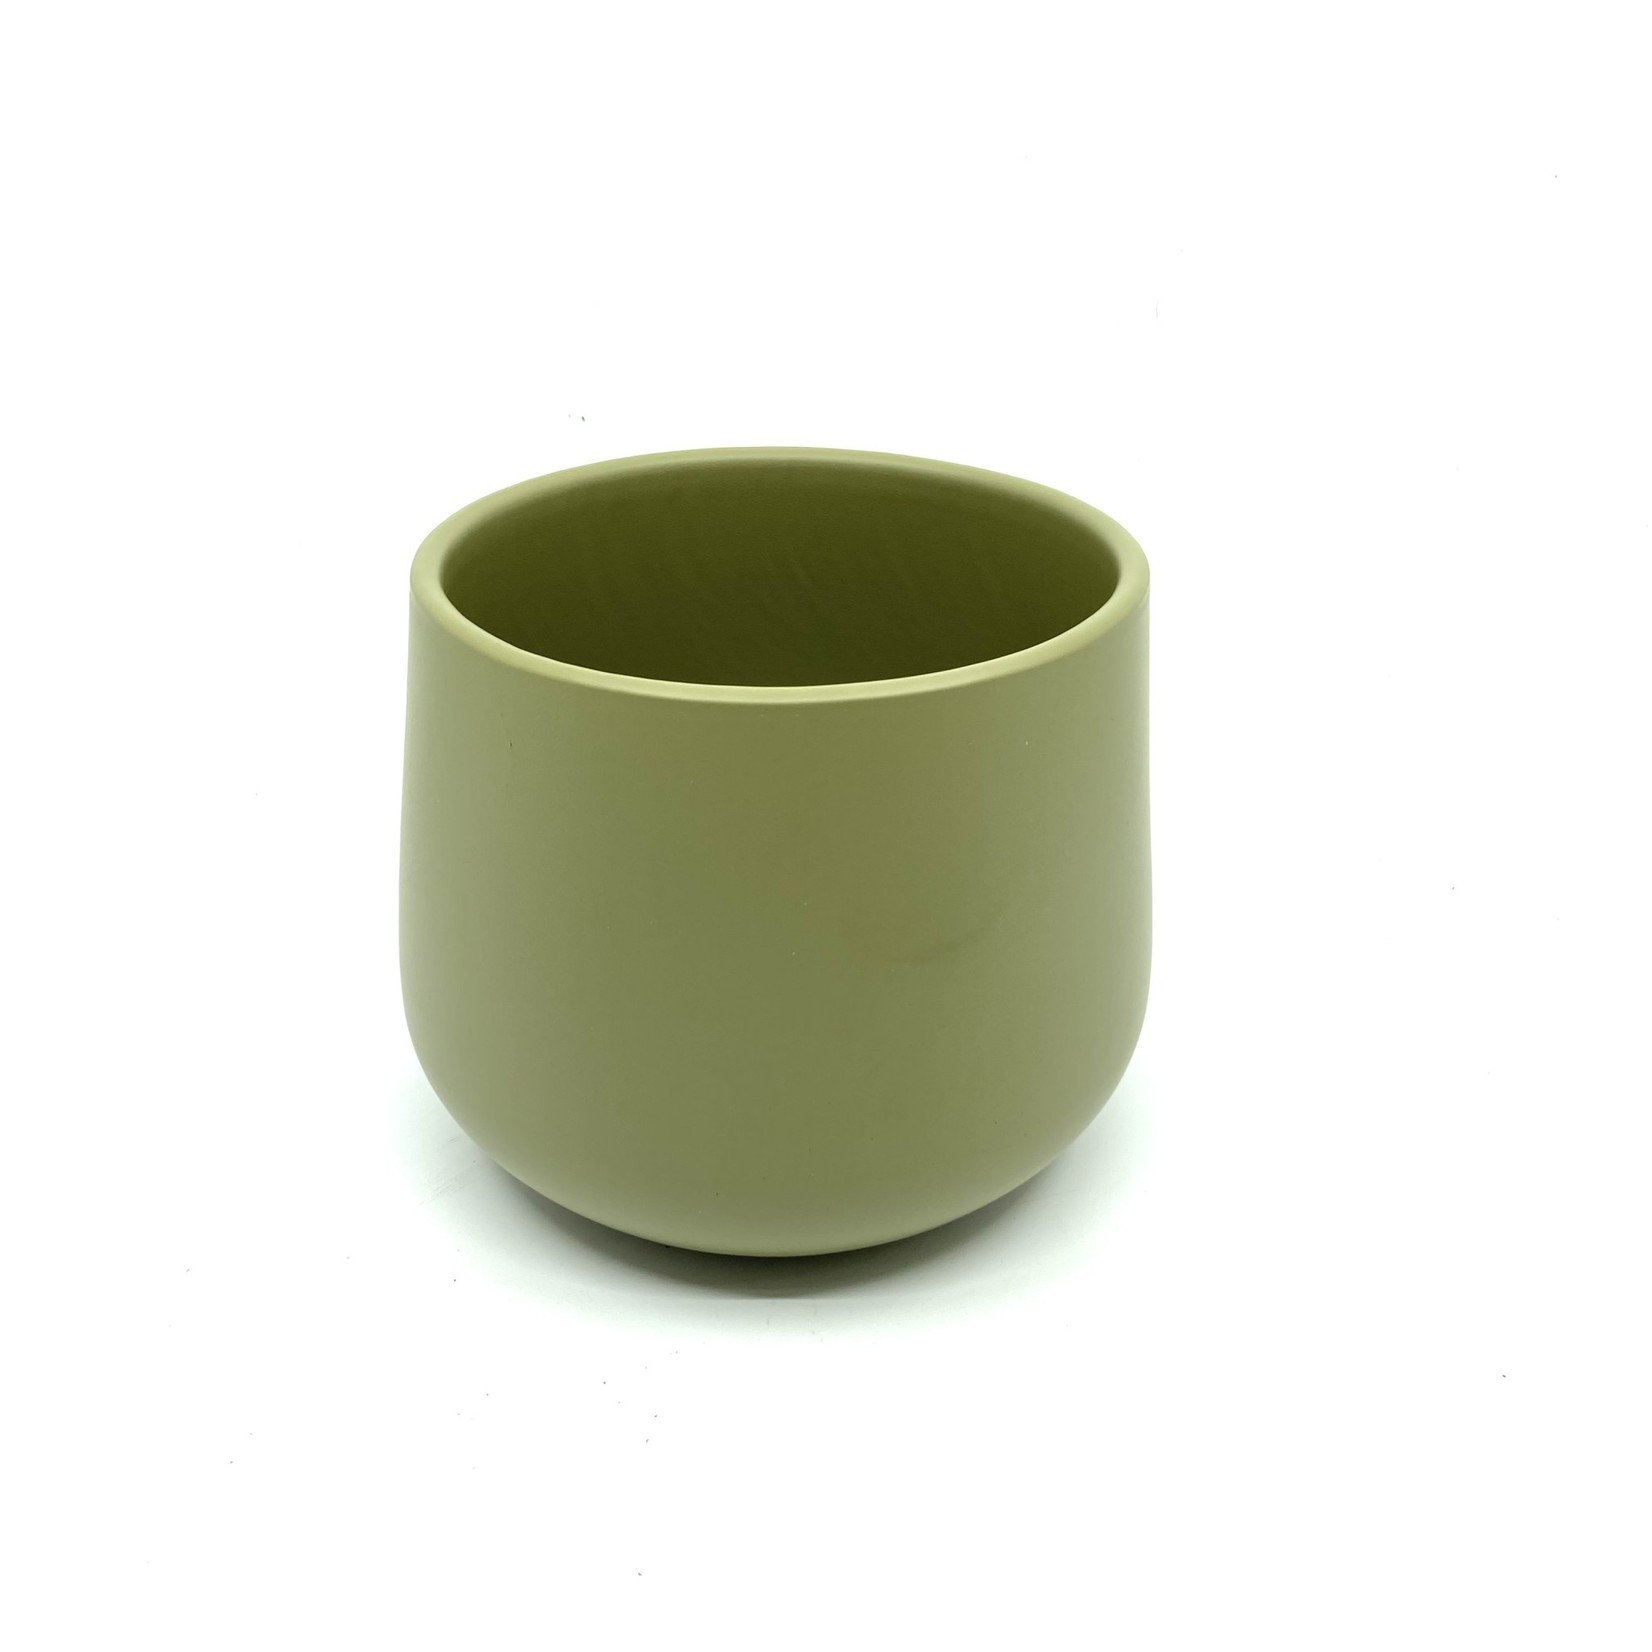 Juul groen ∅ 14cm